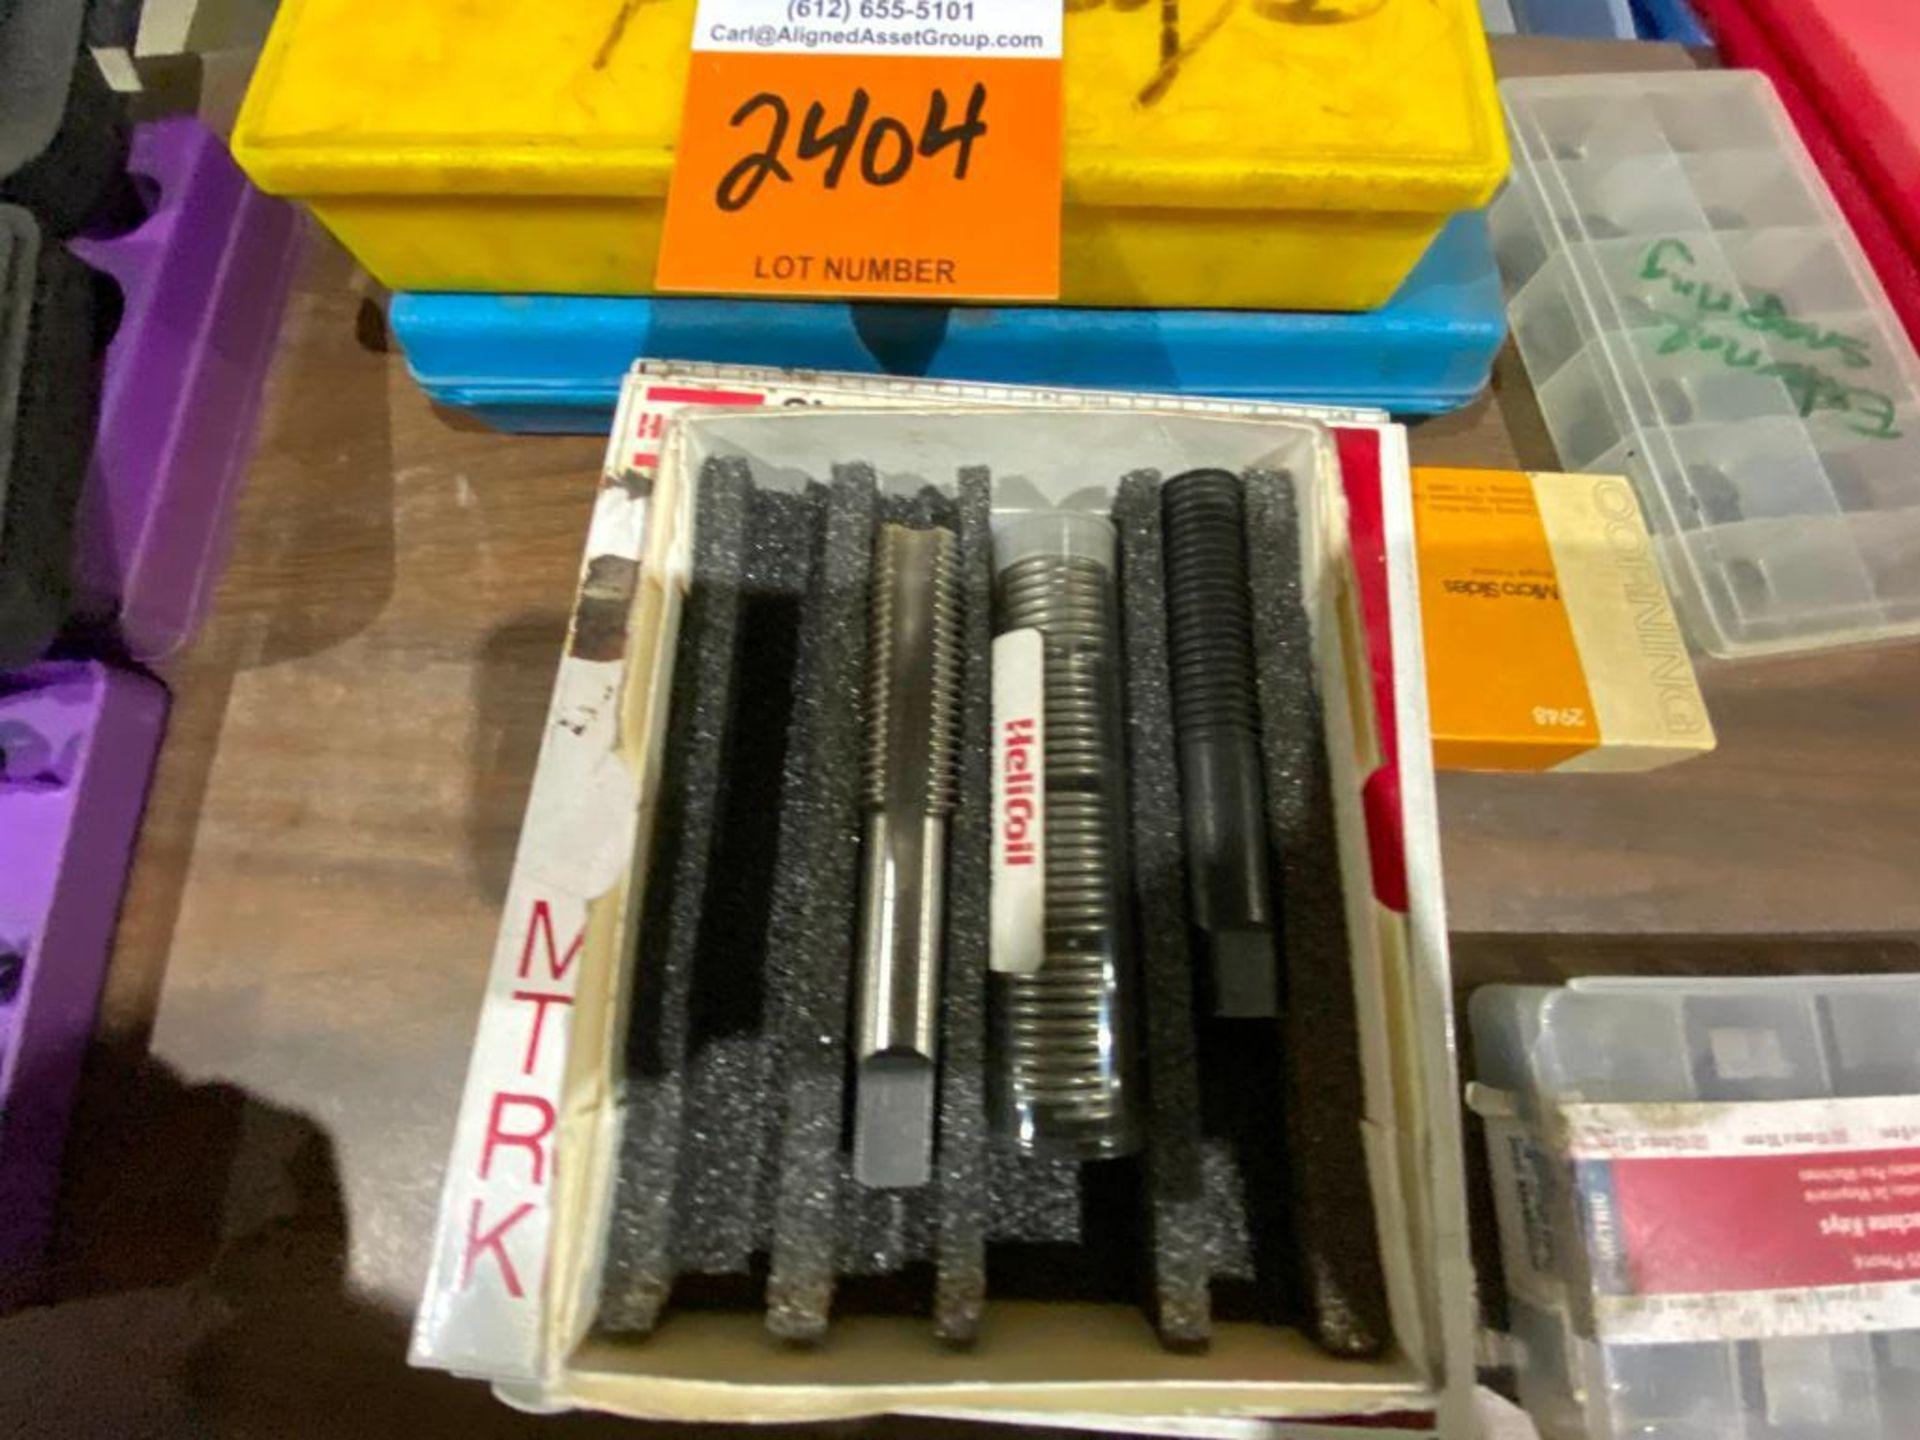 measuring equipment and thread repair - Image 4 of 18